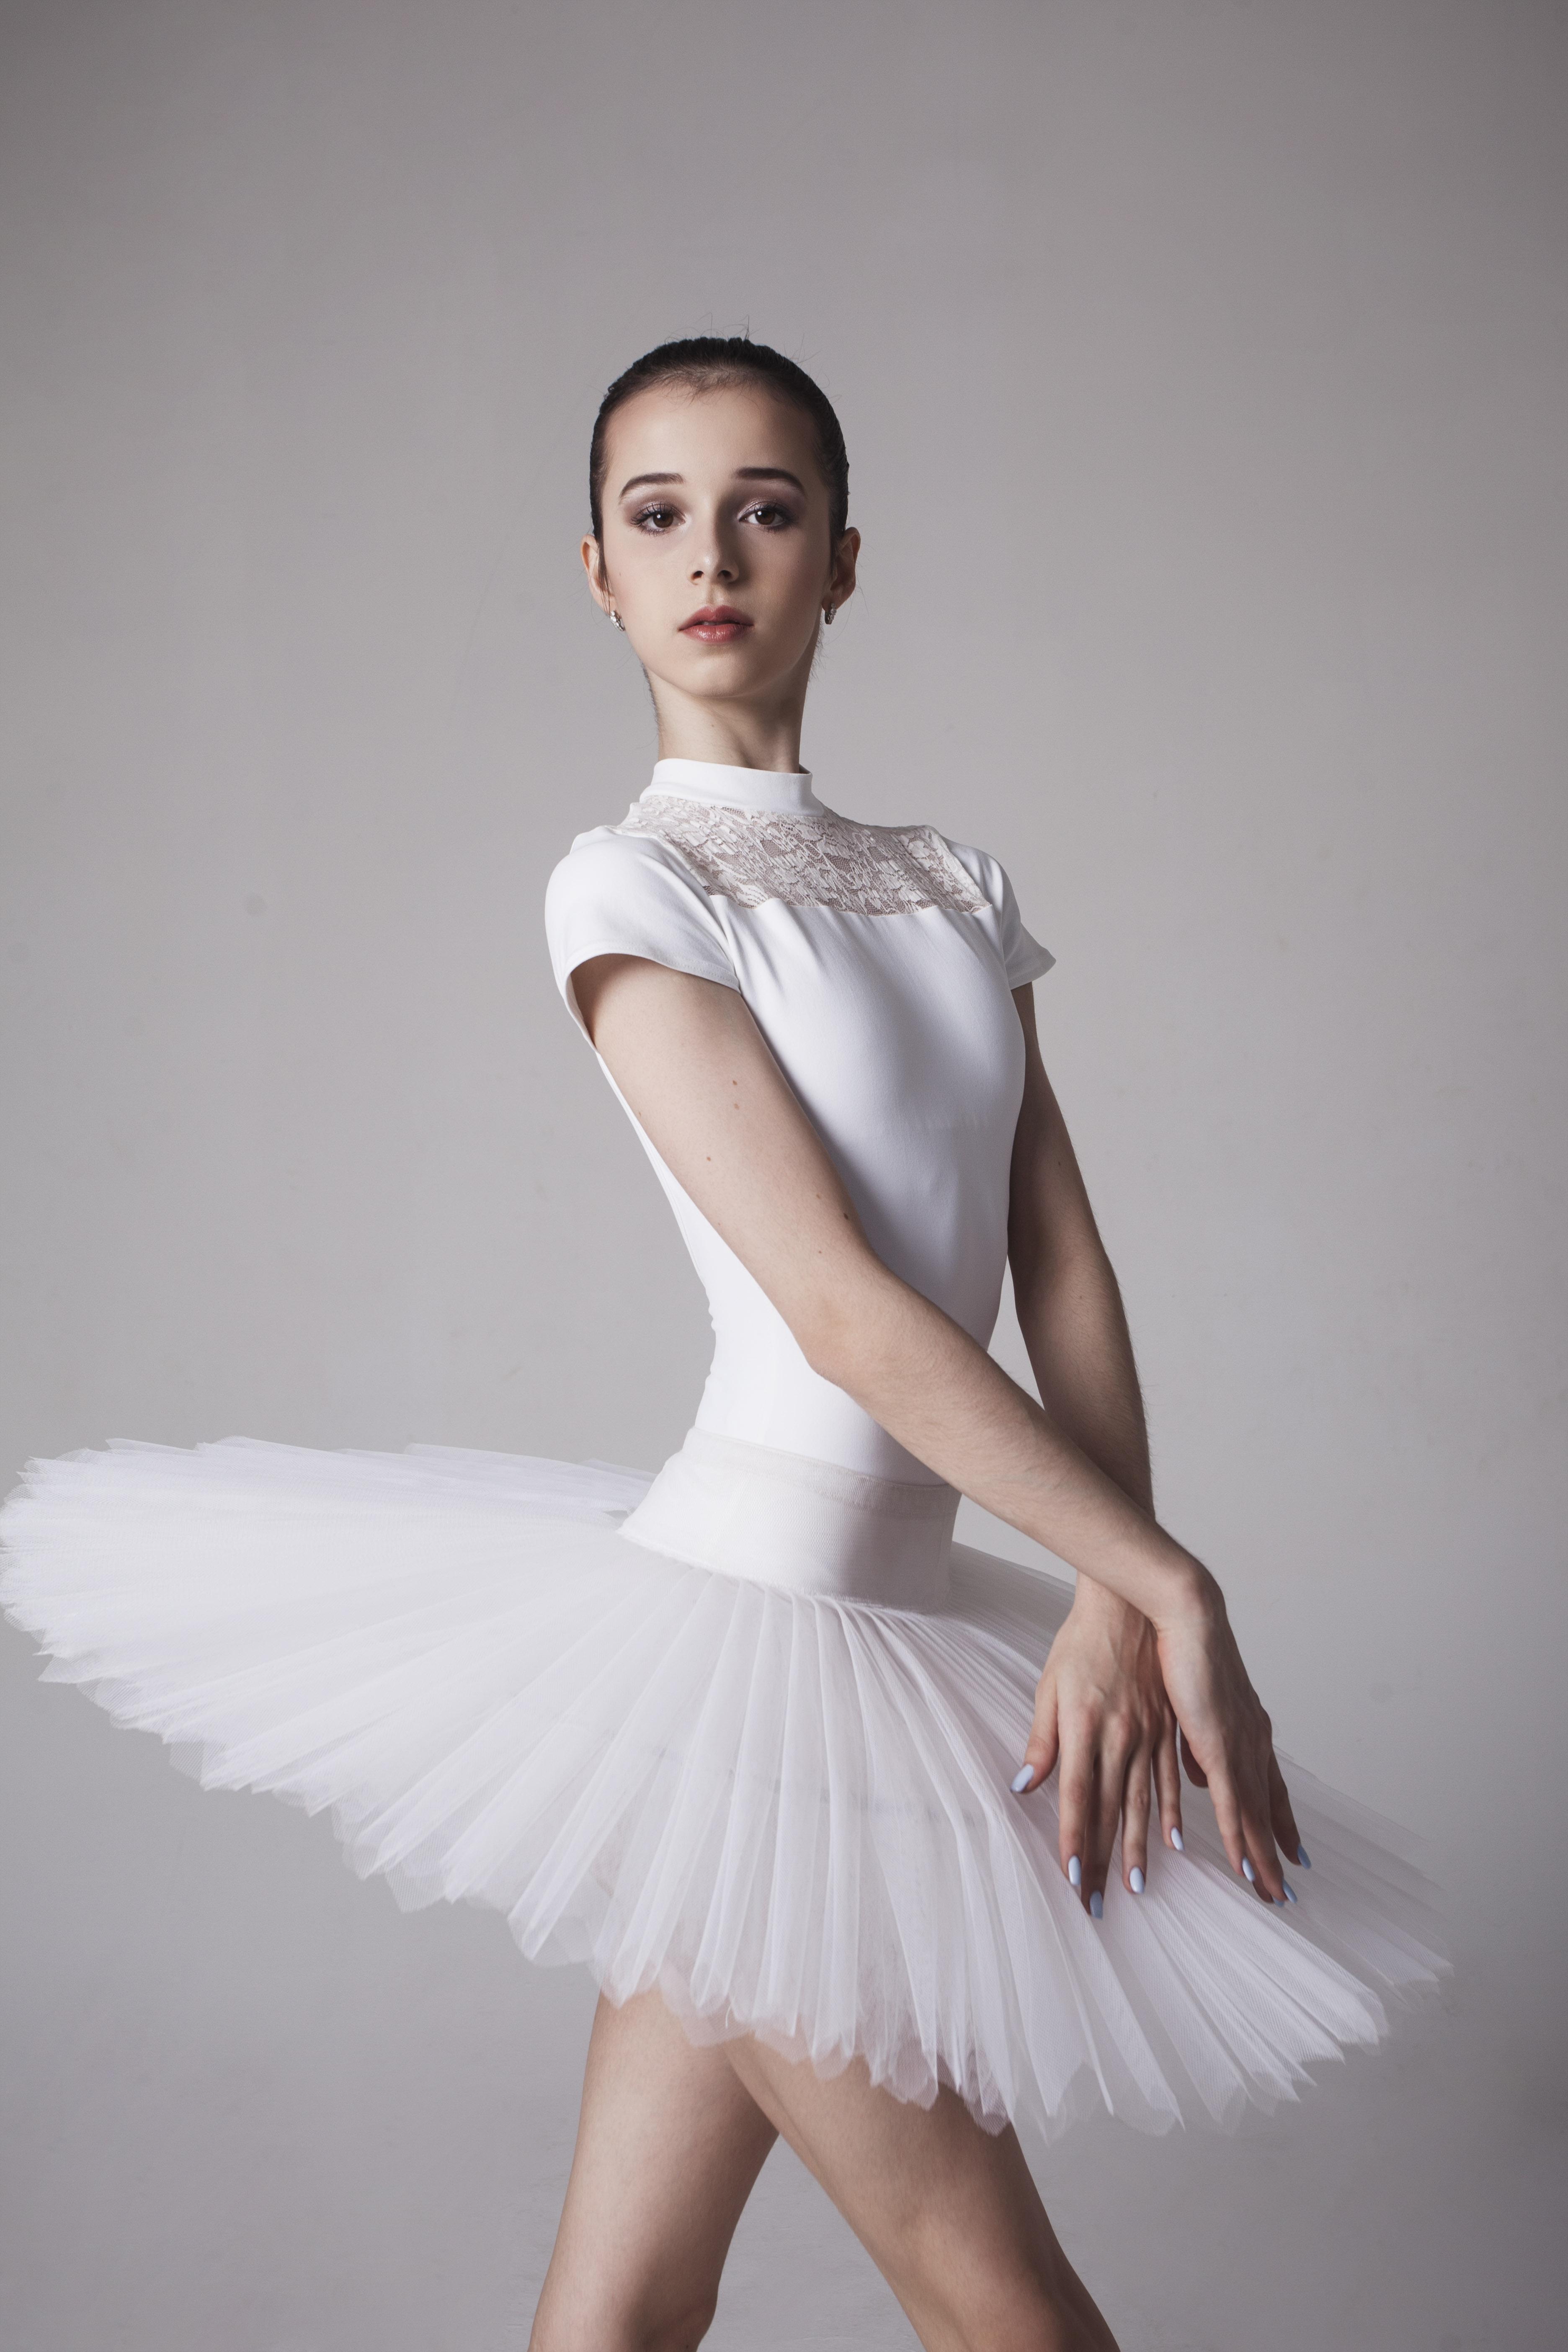 Maria Khoreva, Russian ballerina